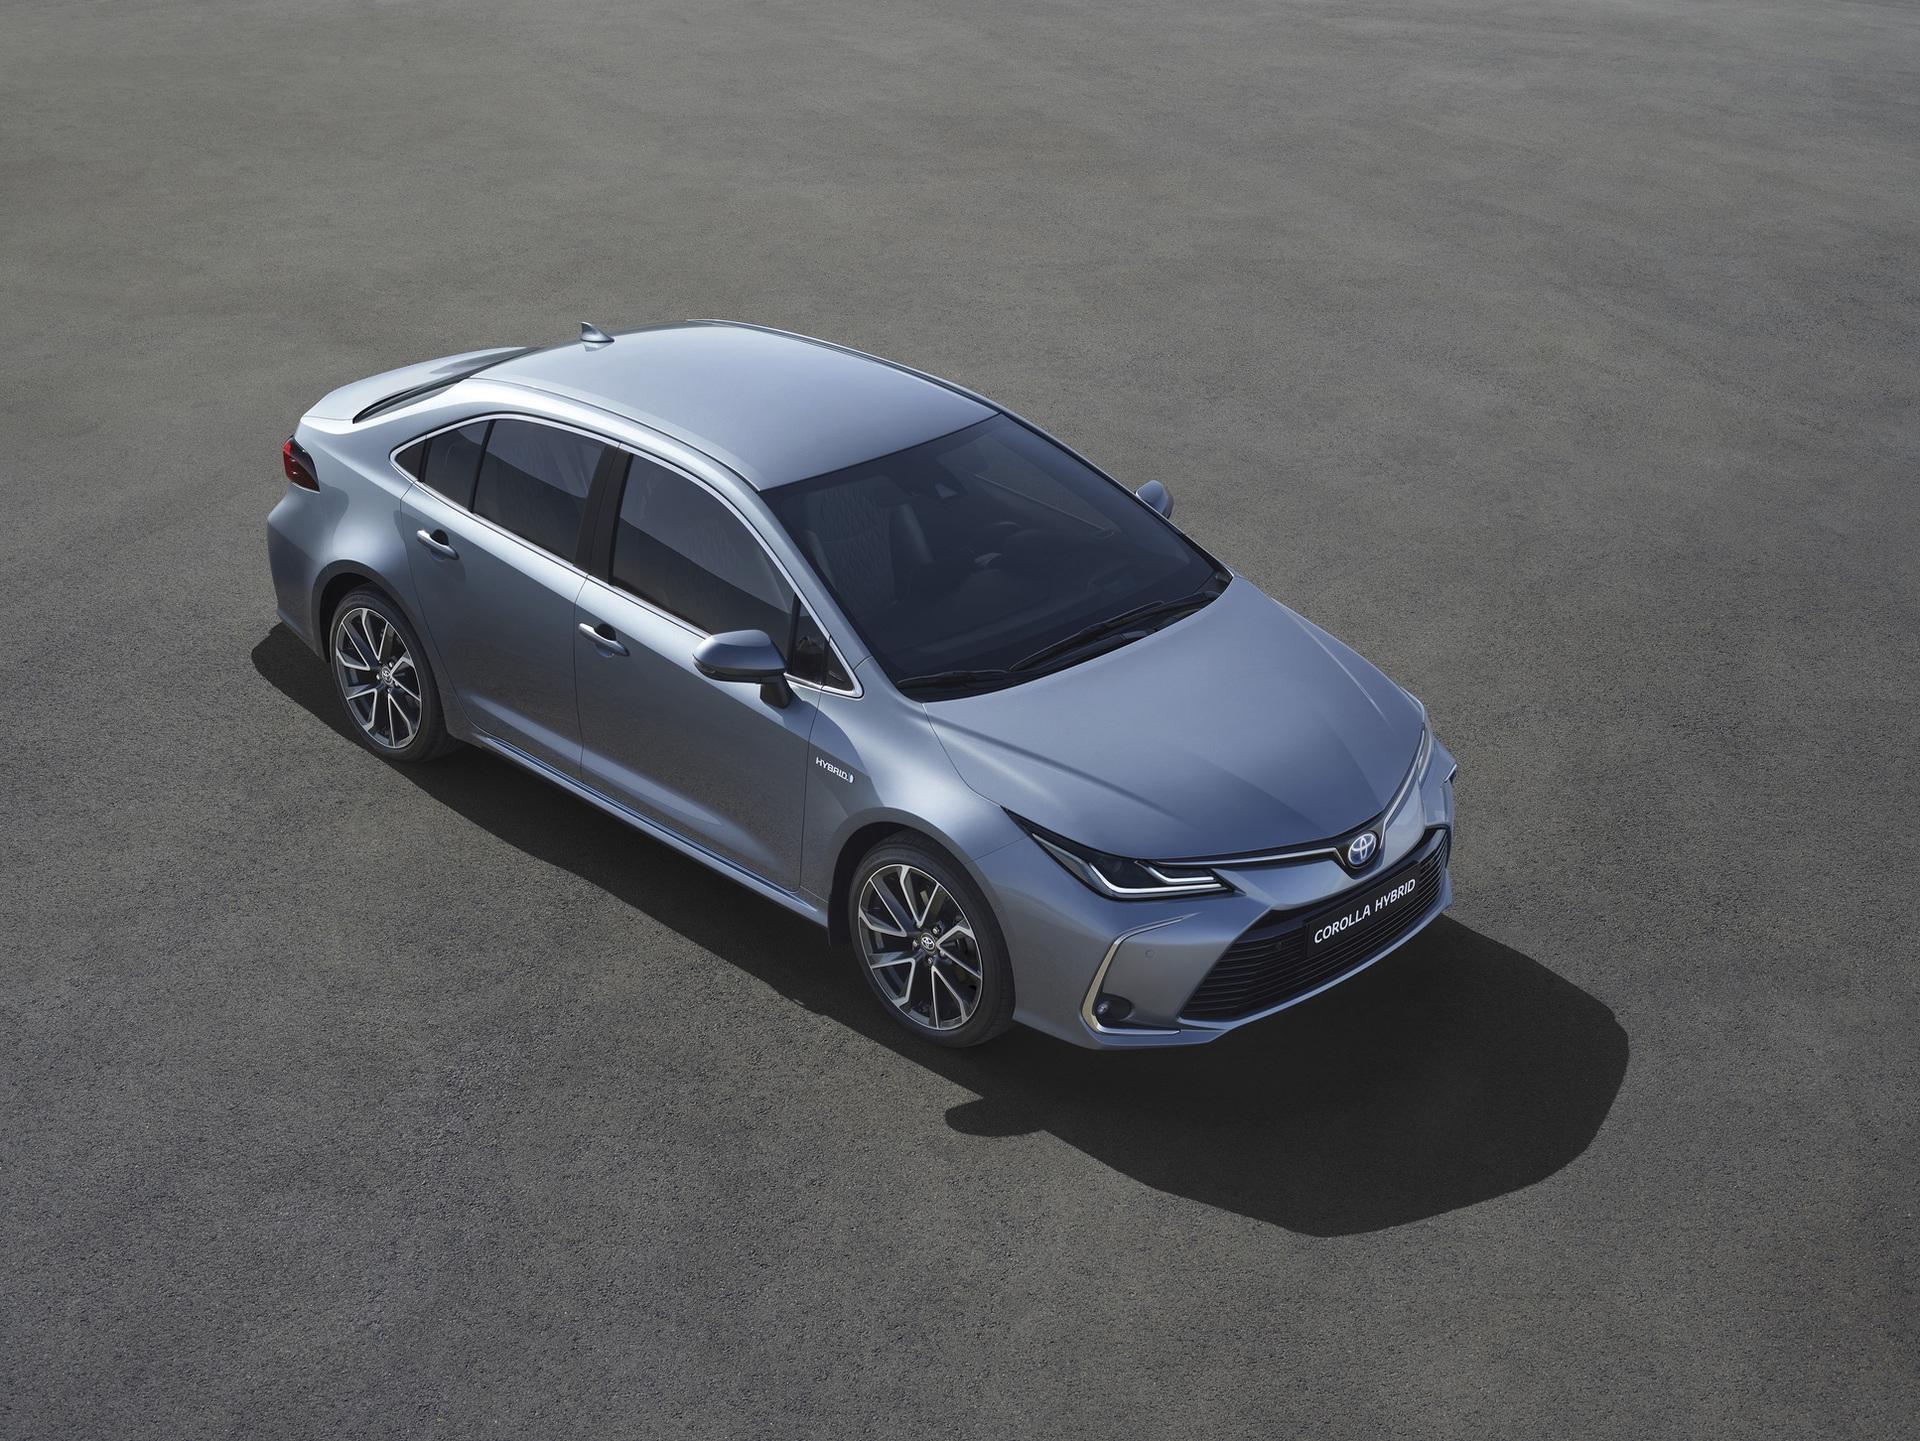 2019_Toyota_Corolla_Sedan_01